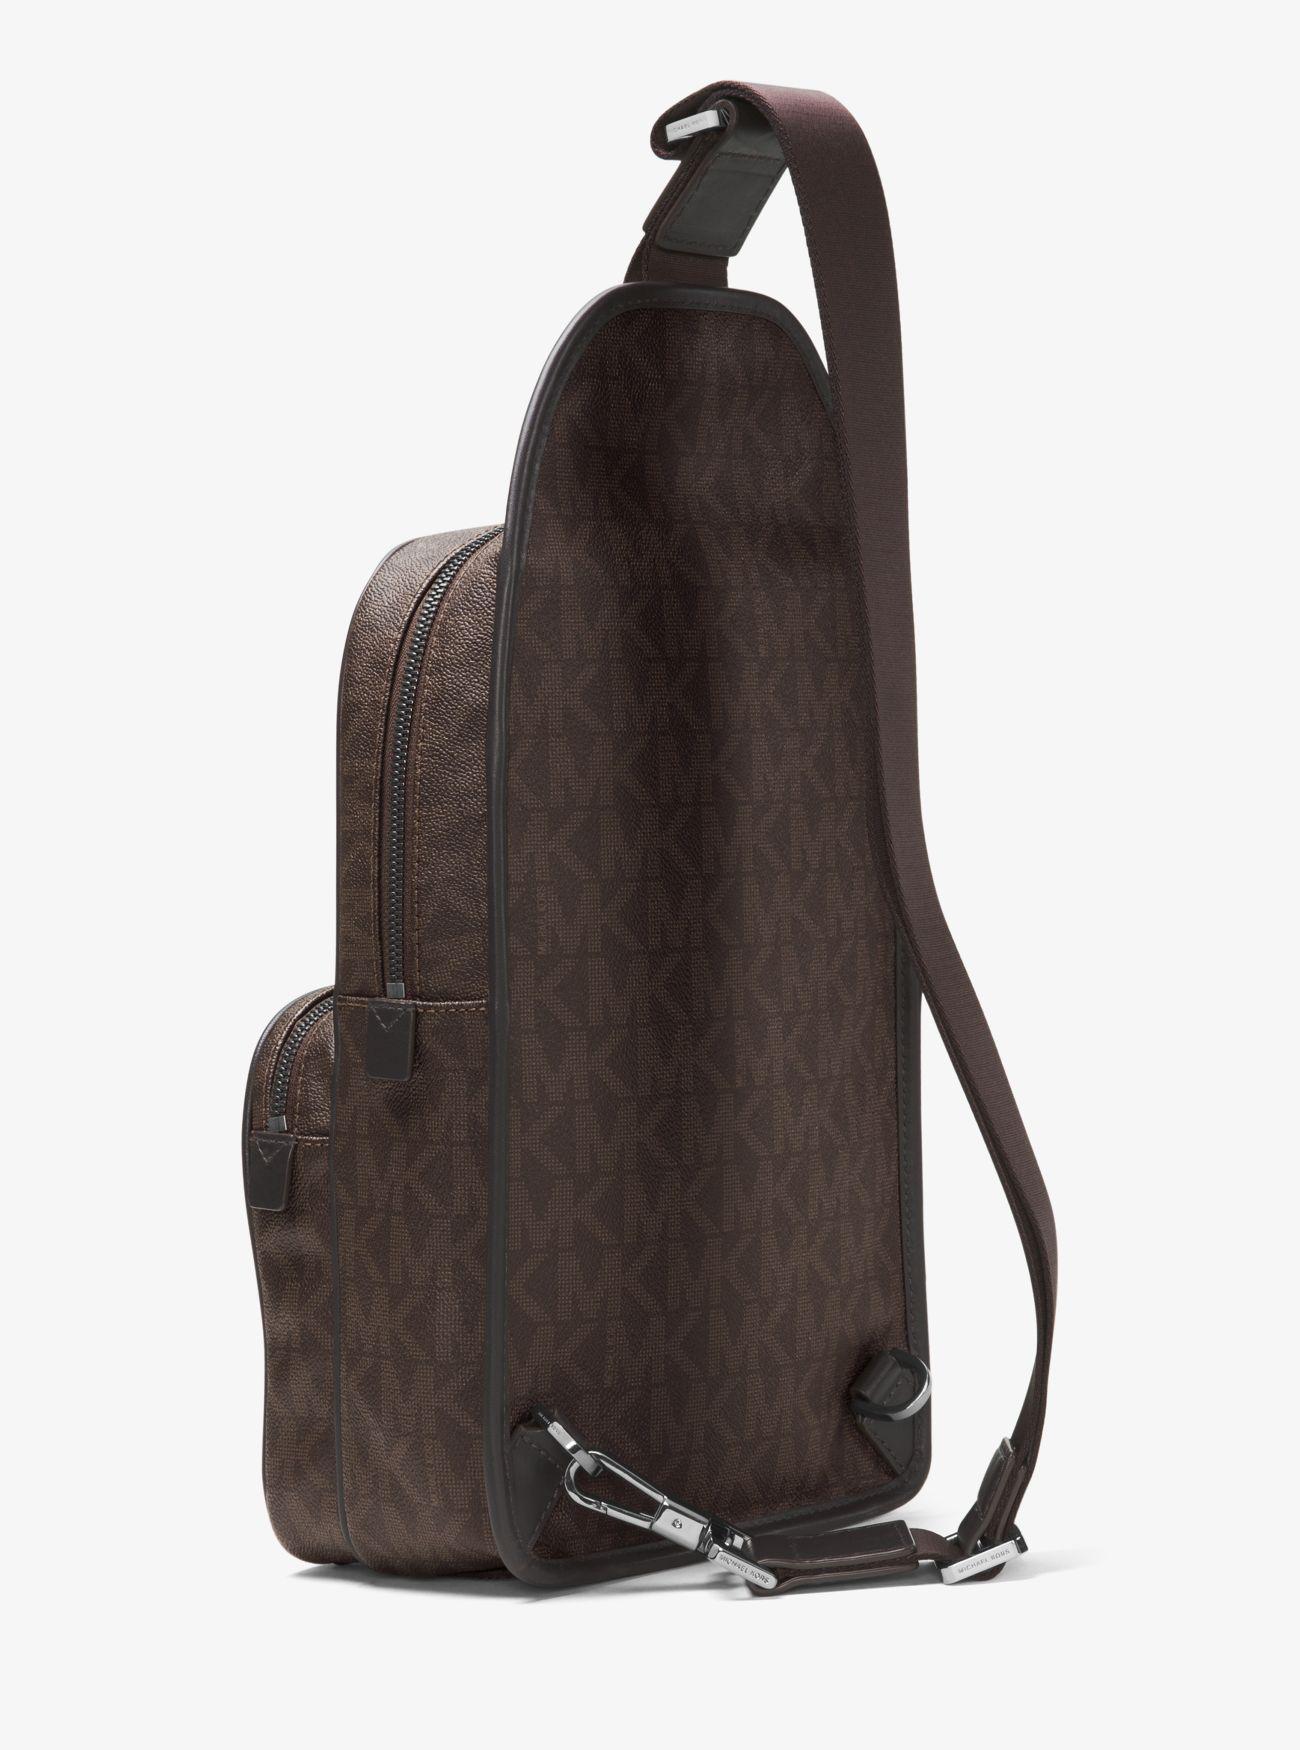 4d9de1845cf2ad Michael Kors Jet Set Travel Logo Sling Pack in Brown for Men - Lyst